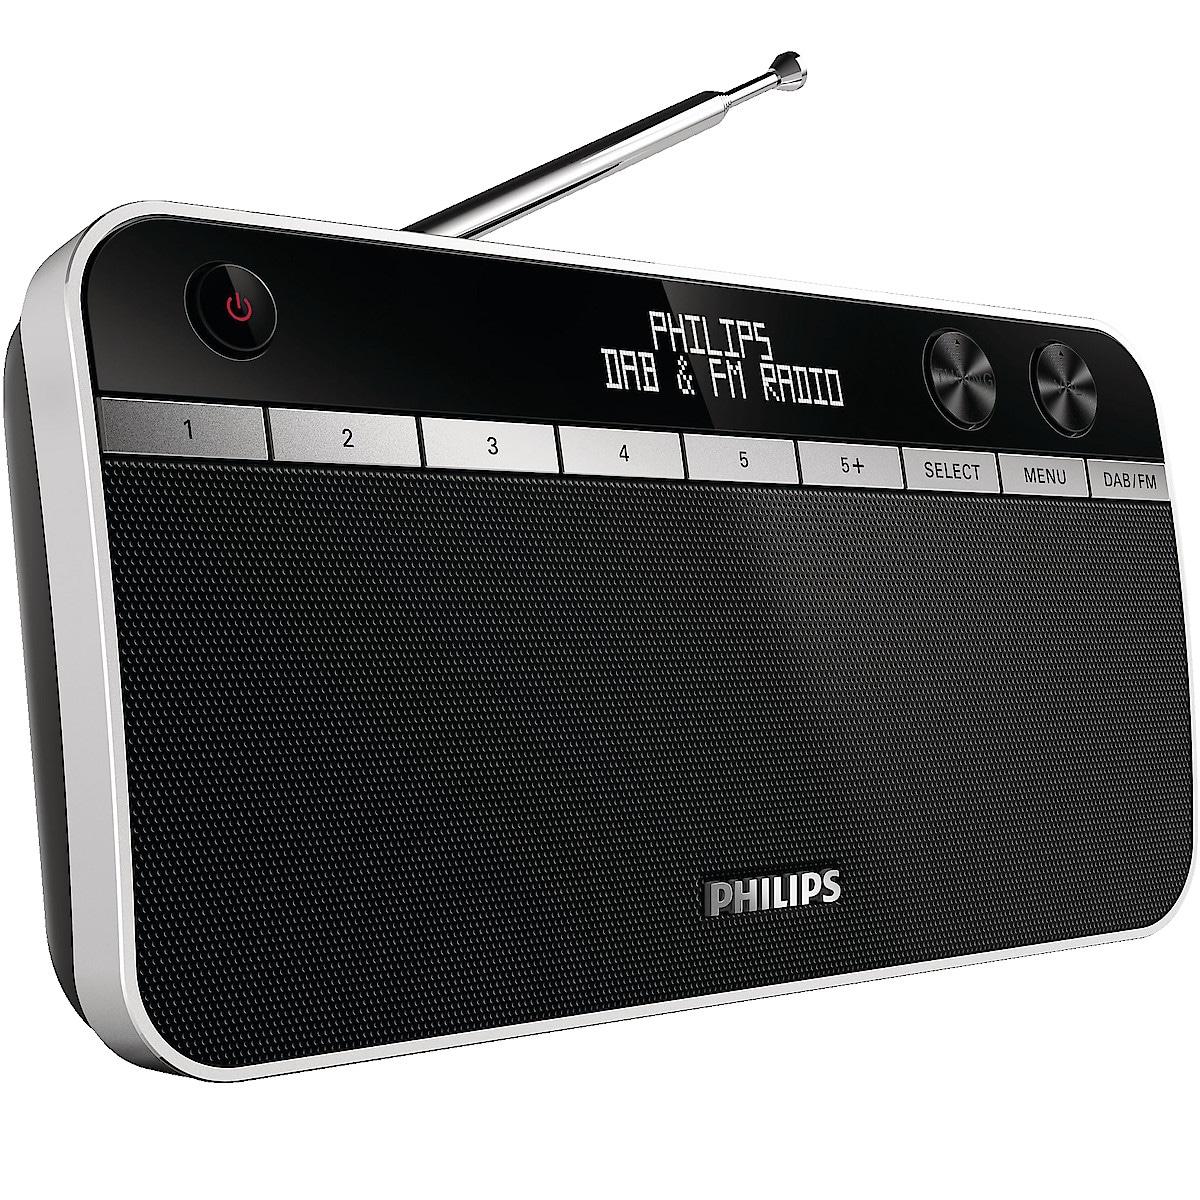 Philips AE5250 DAB+/FM-radio